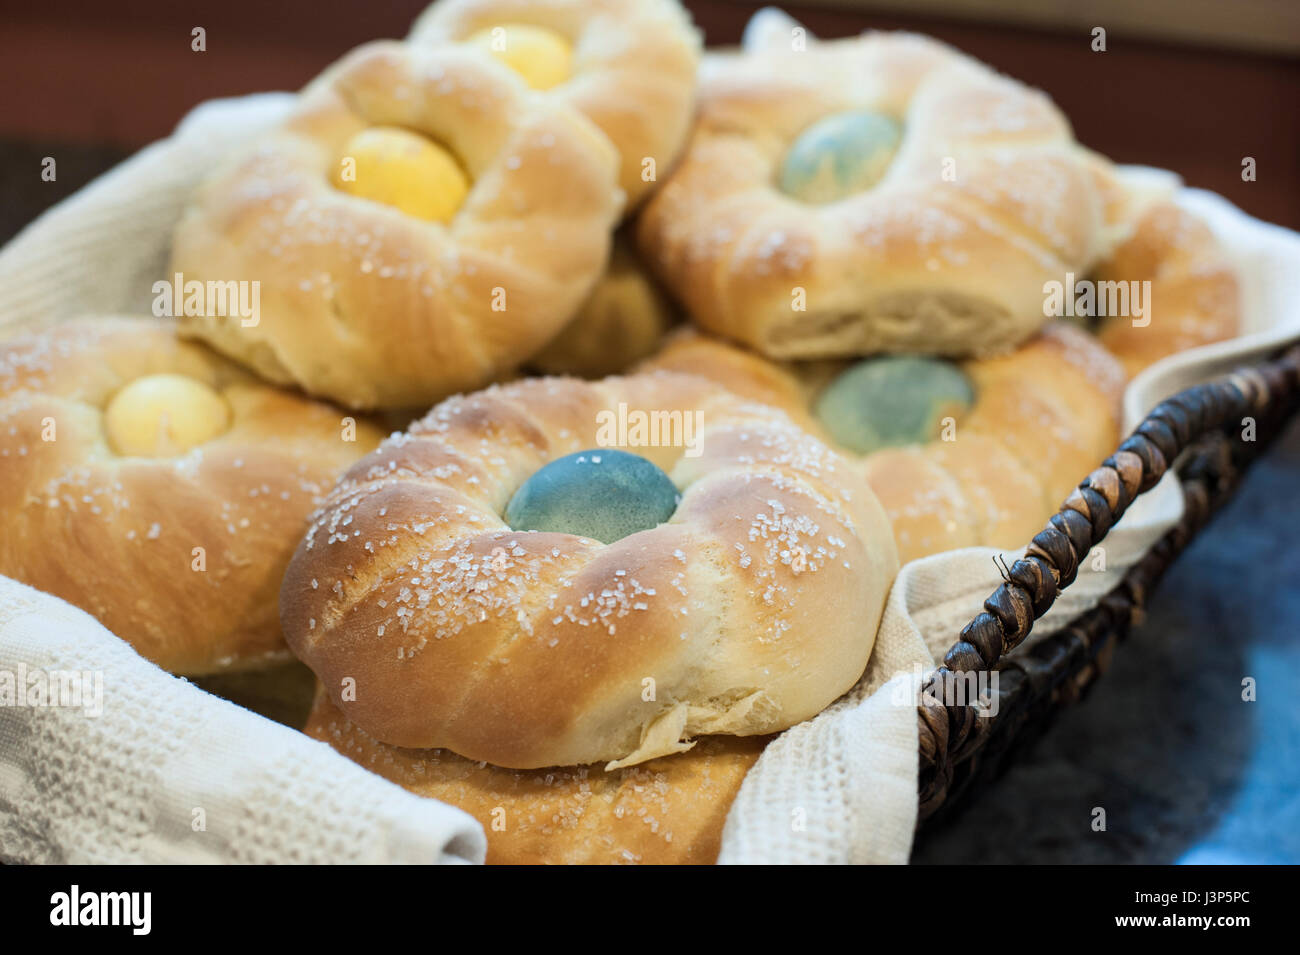 Basket of Baked Italian Sweet Bread Loaves - Stock Image